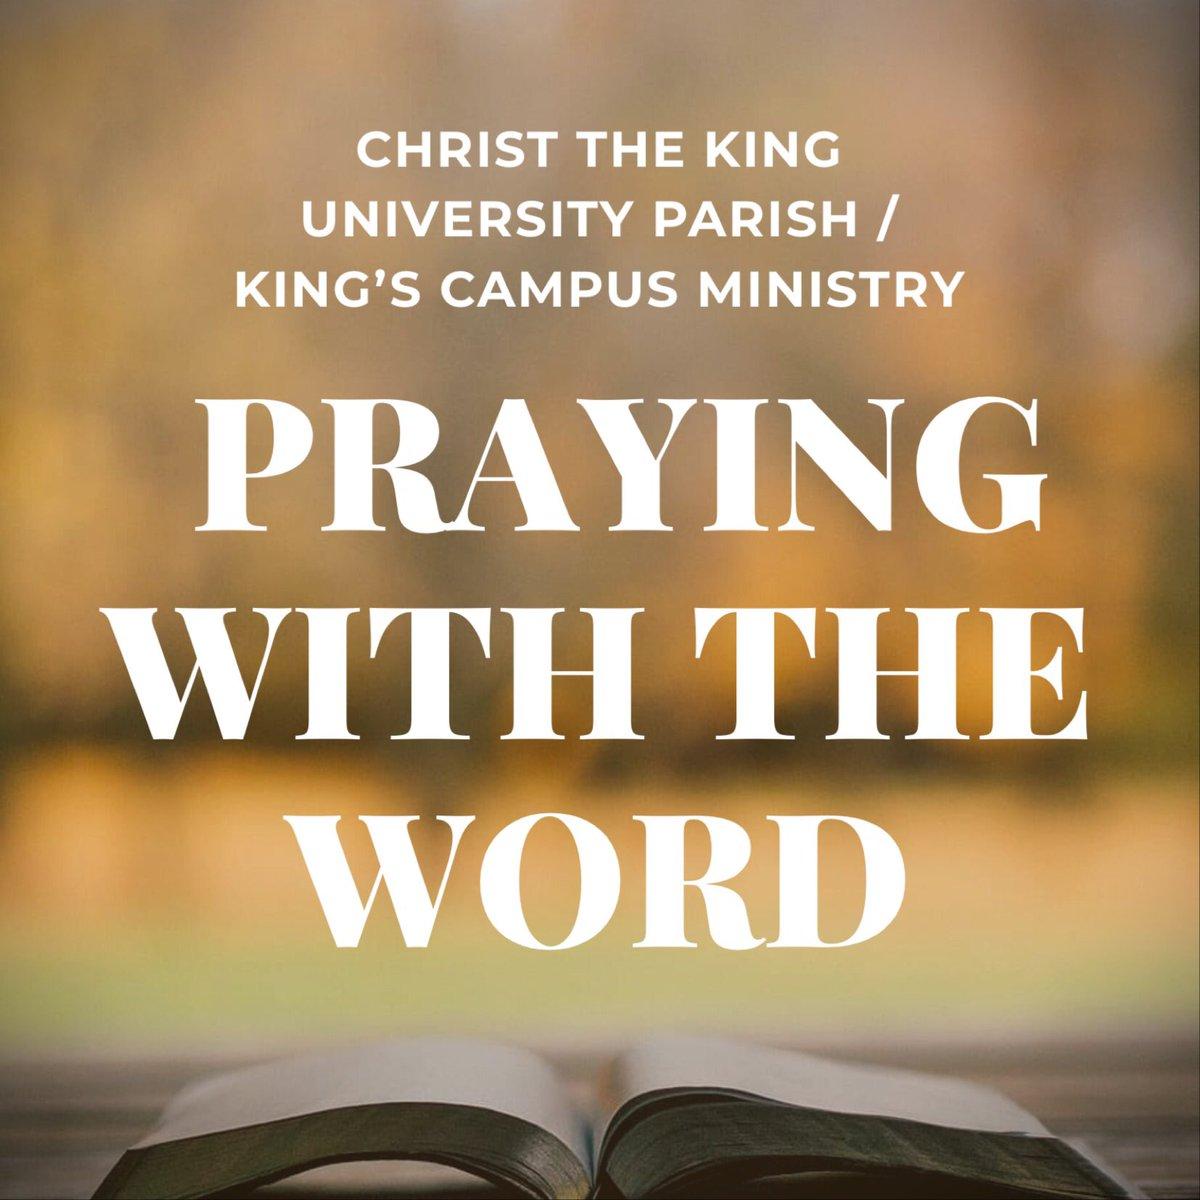 🙏🏻 PRAYING WITH THE WORD for PENTECOST SUNDAY: We offer this prayer resource: https://t.co/21Ib6Or7yJ #prayingathome #easter @kingsatwestern @DOL_ca @KUCalumni @KUCSC @kingsprincipal @askDeanJoe @KingsLib https://t.co/S6czaX6Hm4